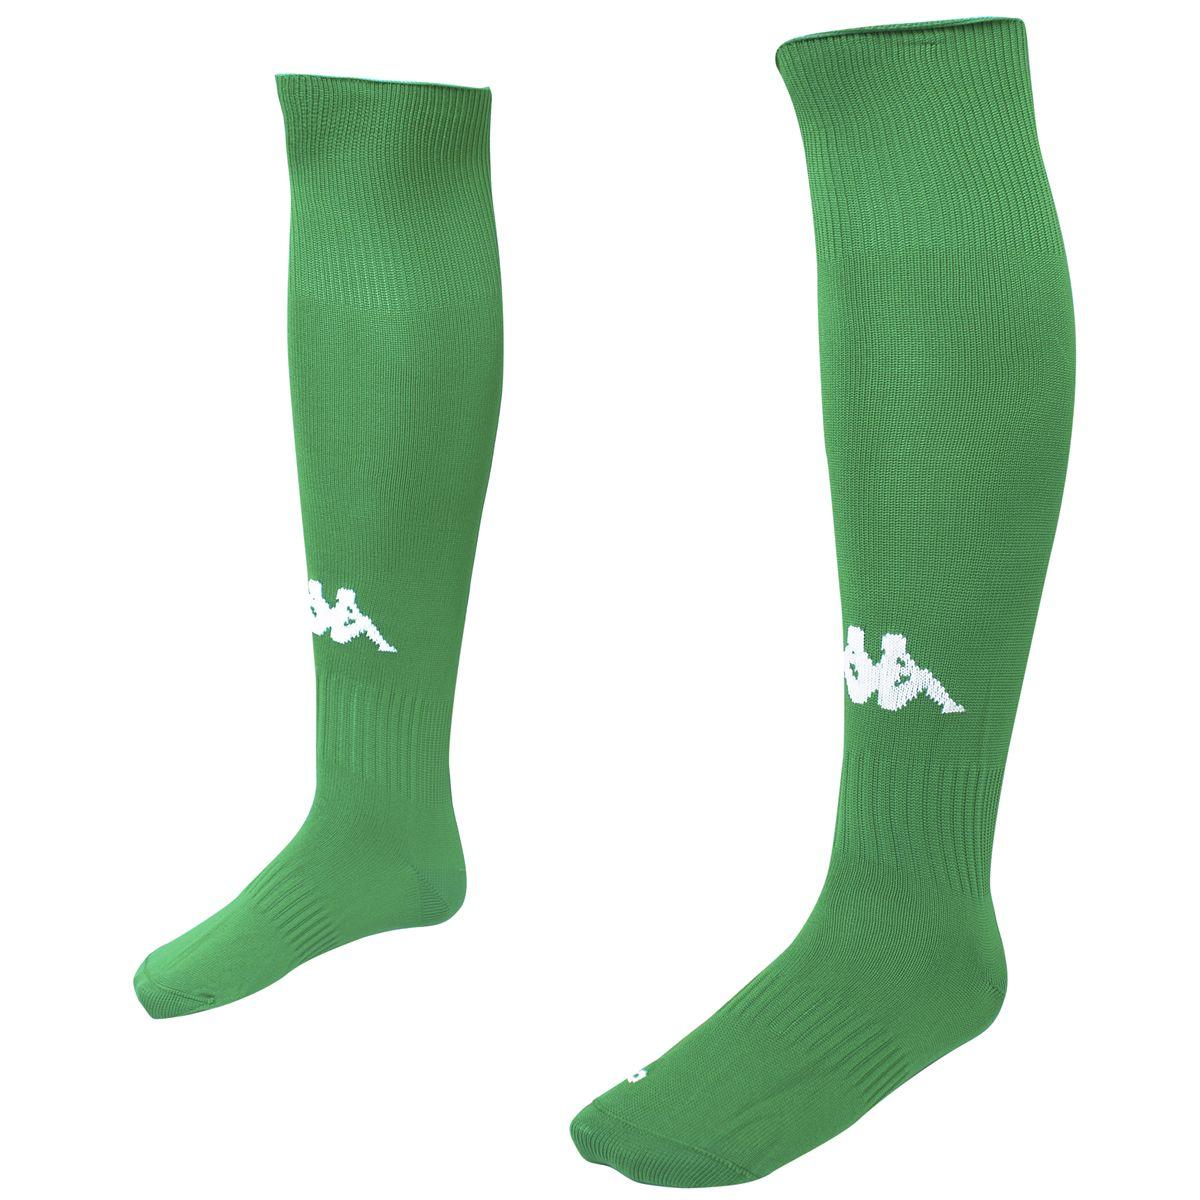 Kappa Knee High Socks Soccer sport Man